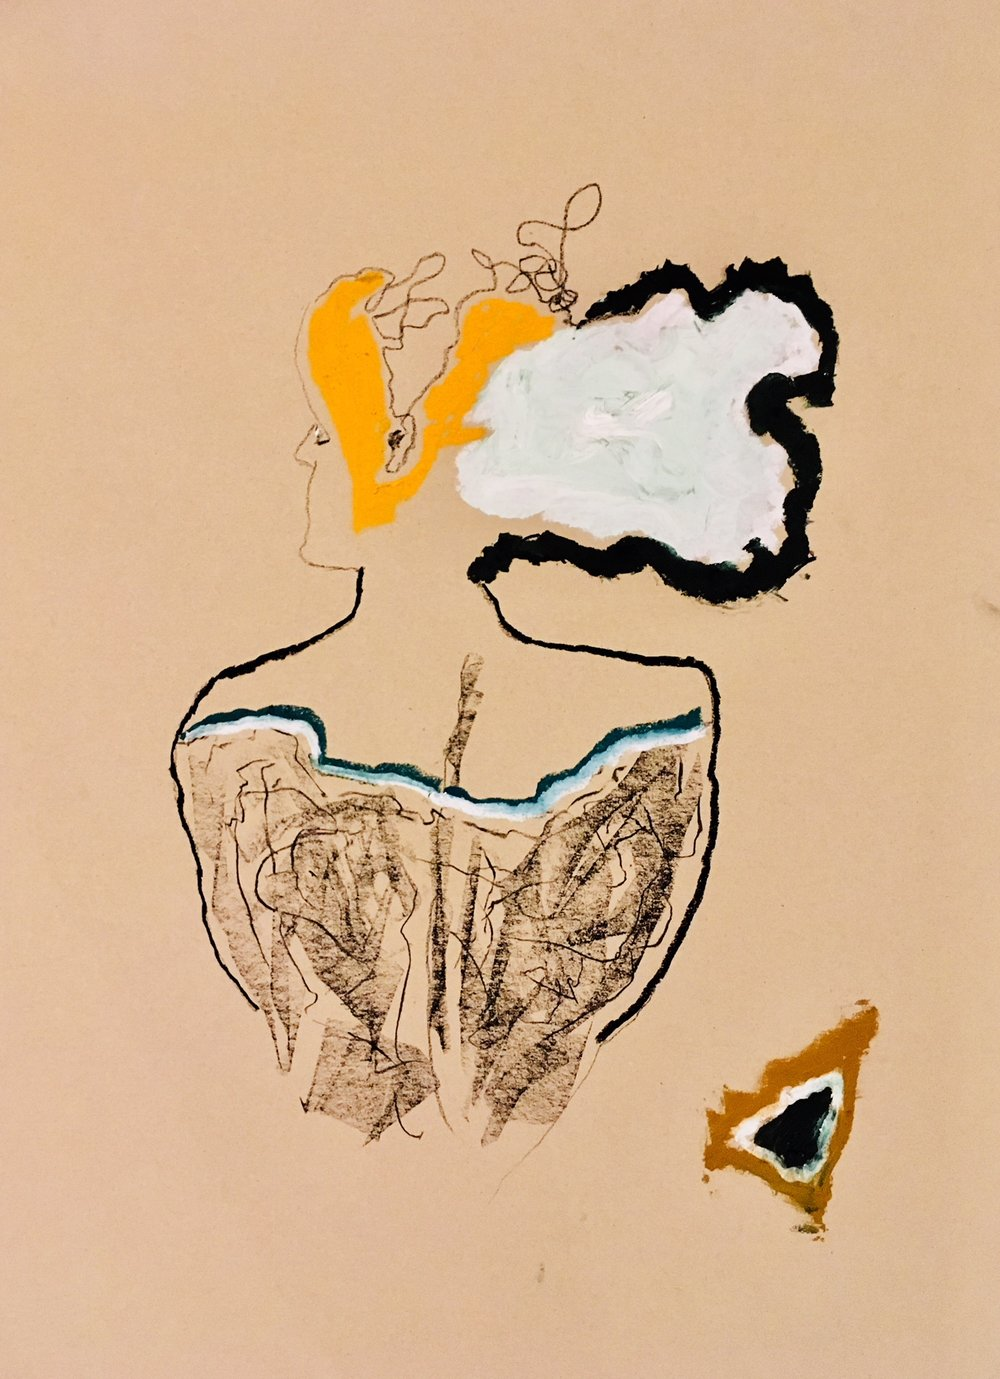 'In Solitude' - 2018 59x42cm. oil/charcoal